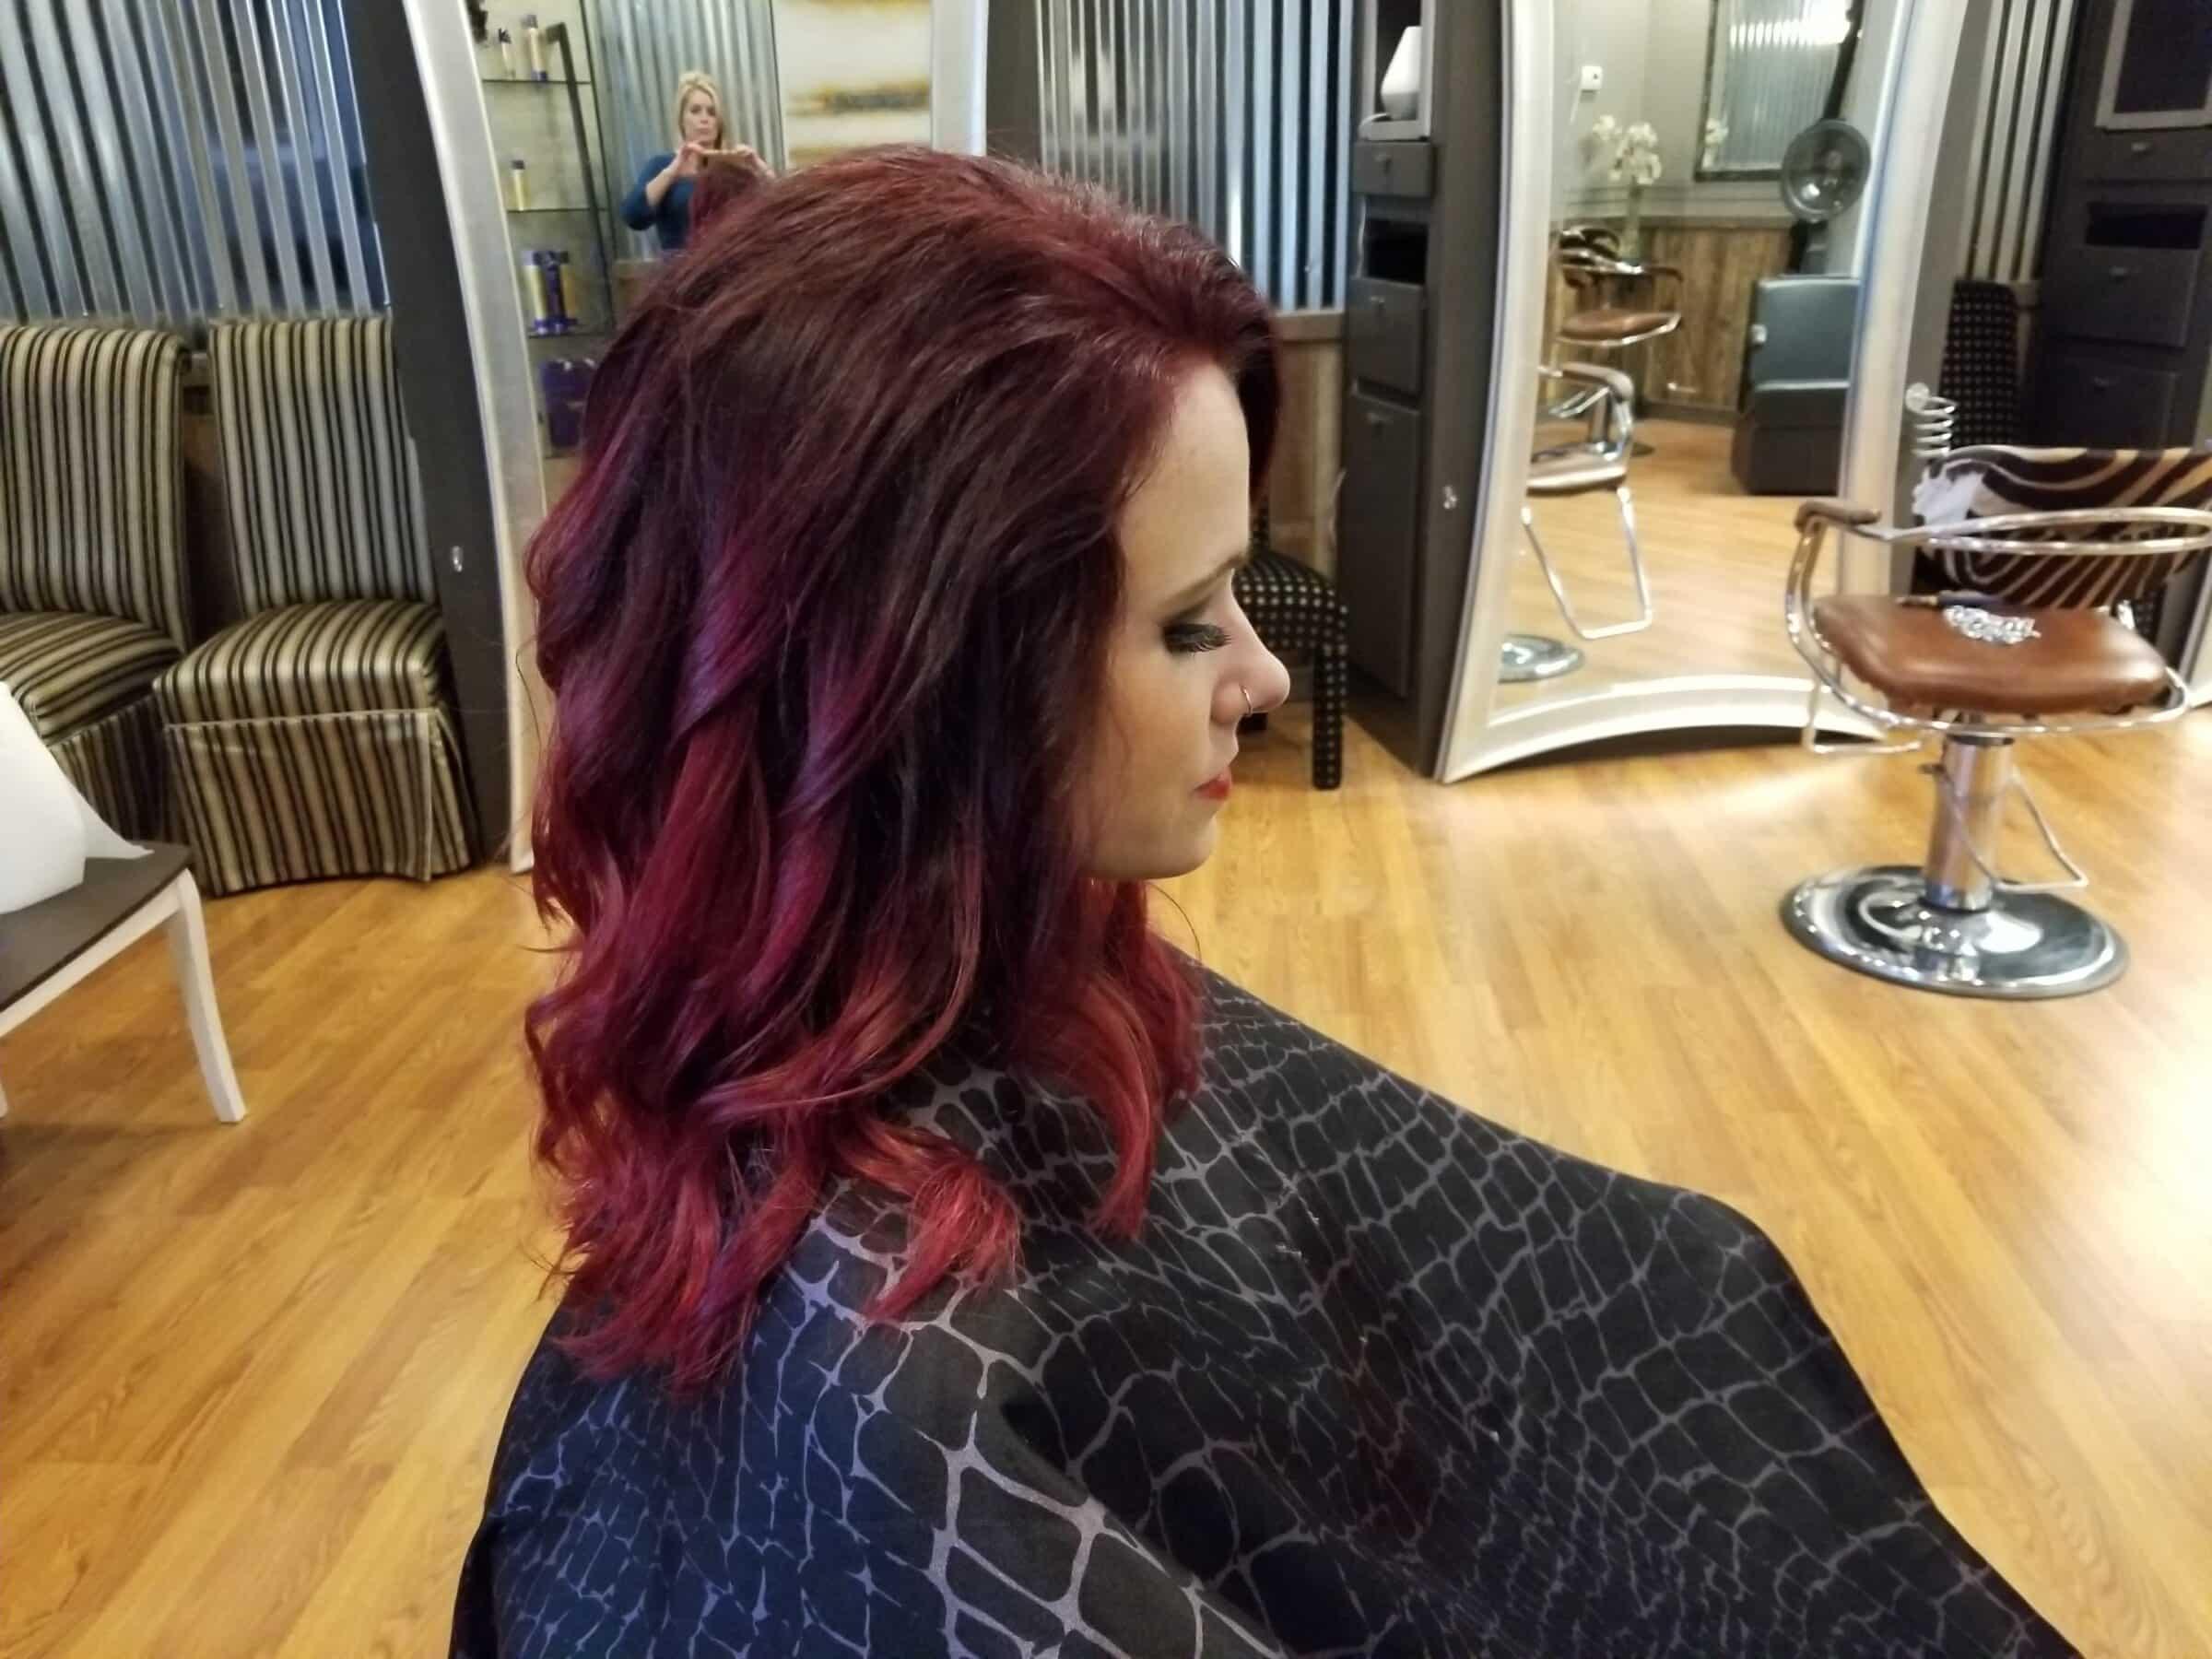 The Best Hair Salon In Destin Destin Hair Studio